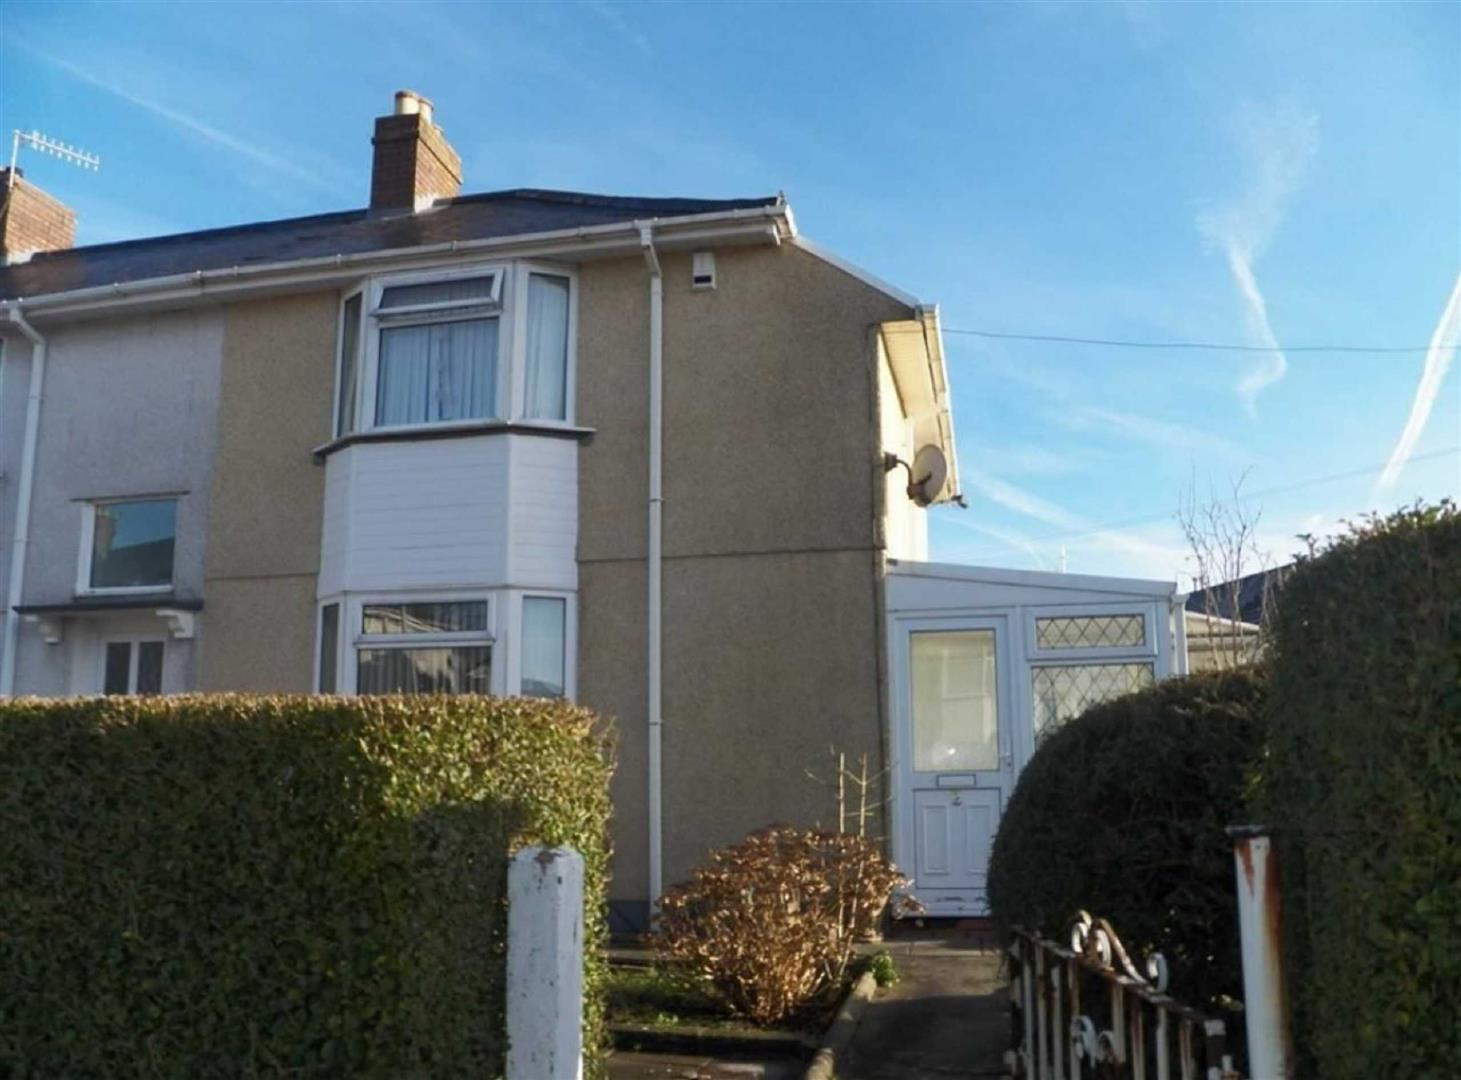 Brondeg, Manselton, Swansea, SA5 8PZ